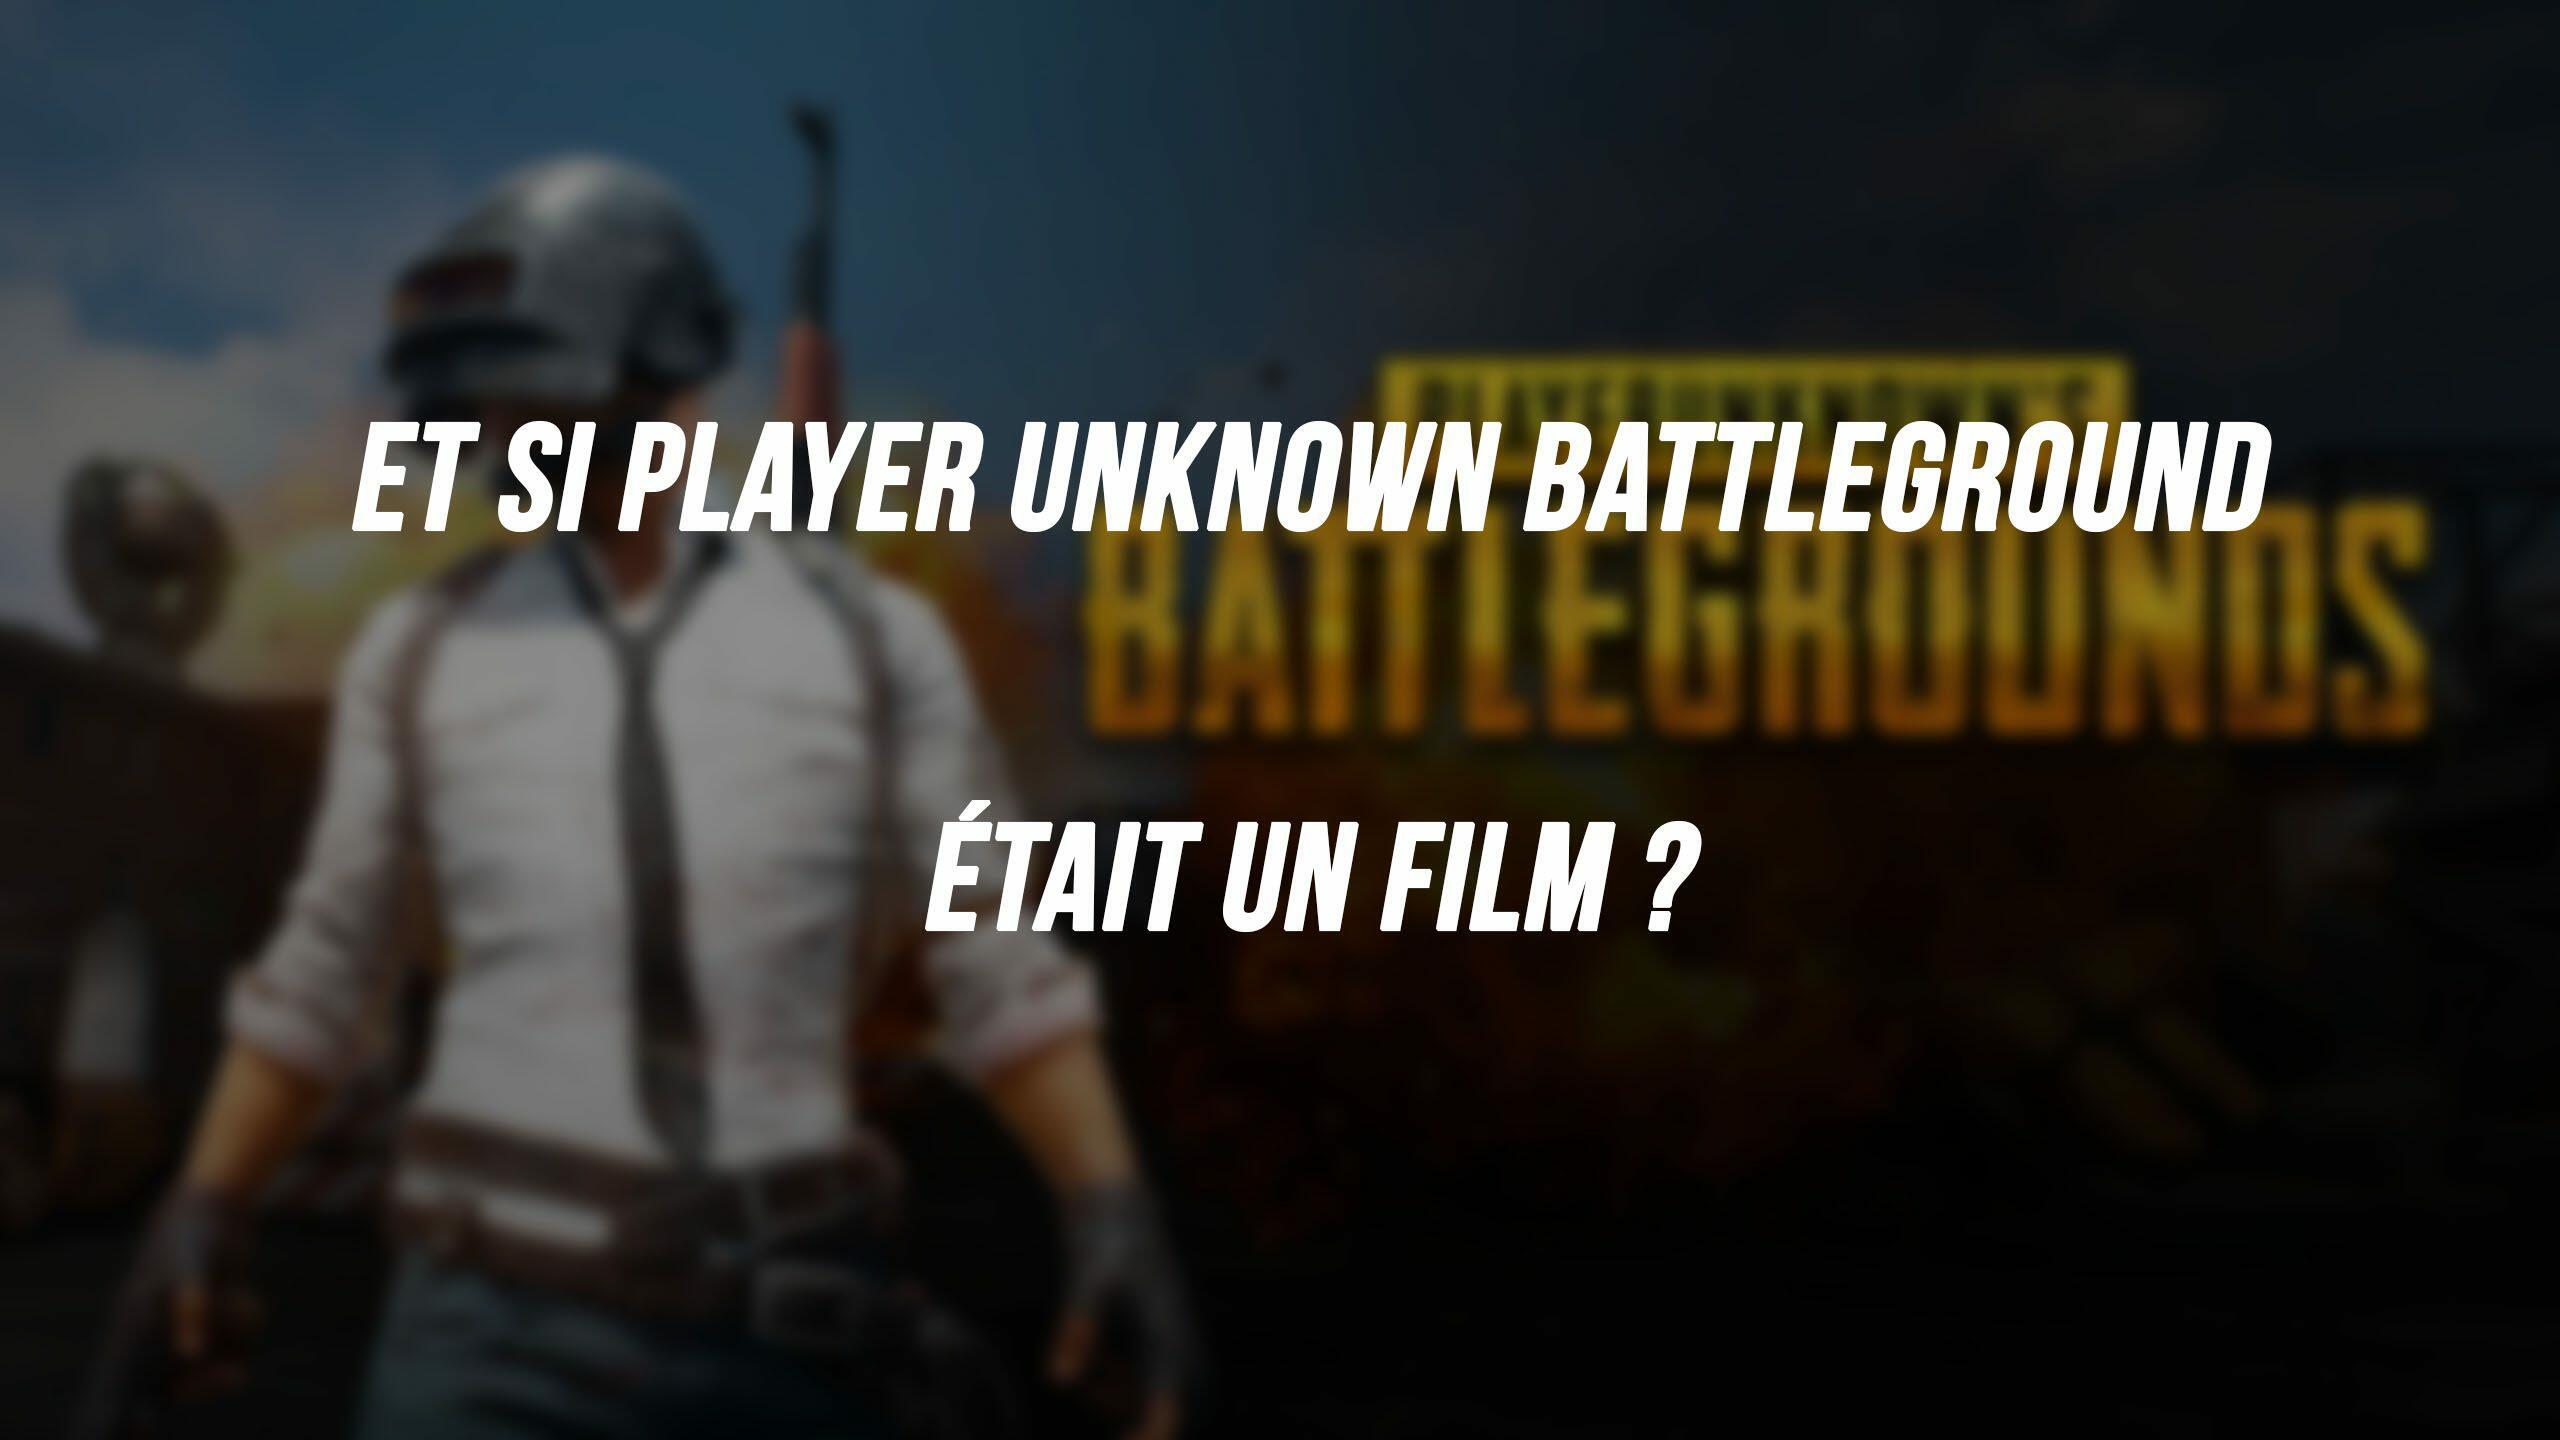 Si PlayerUnknown's Battlegrounds était un film ?